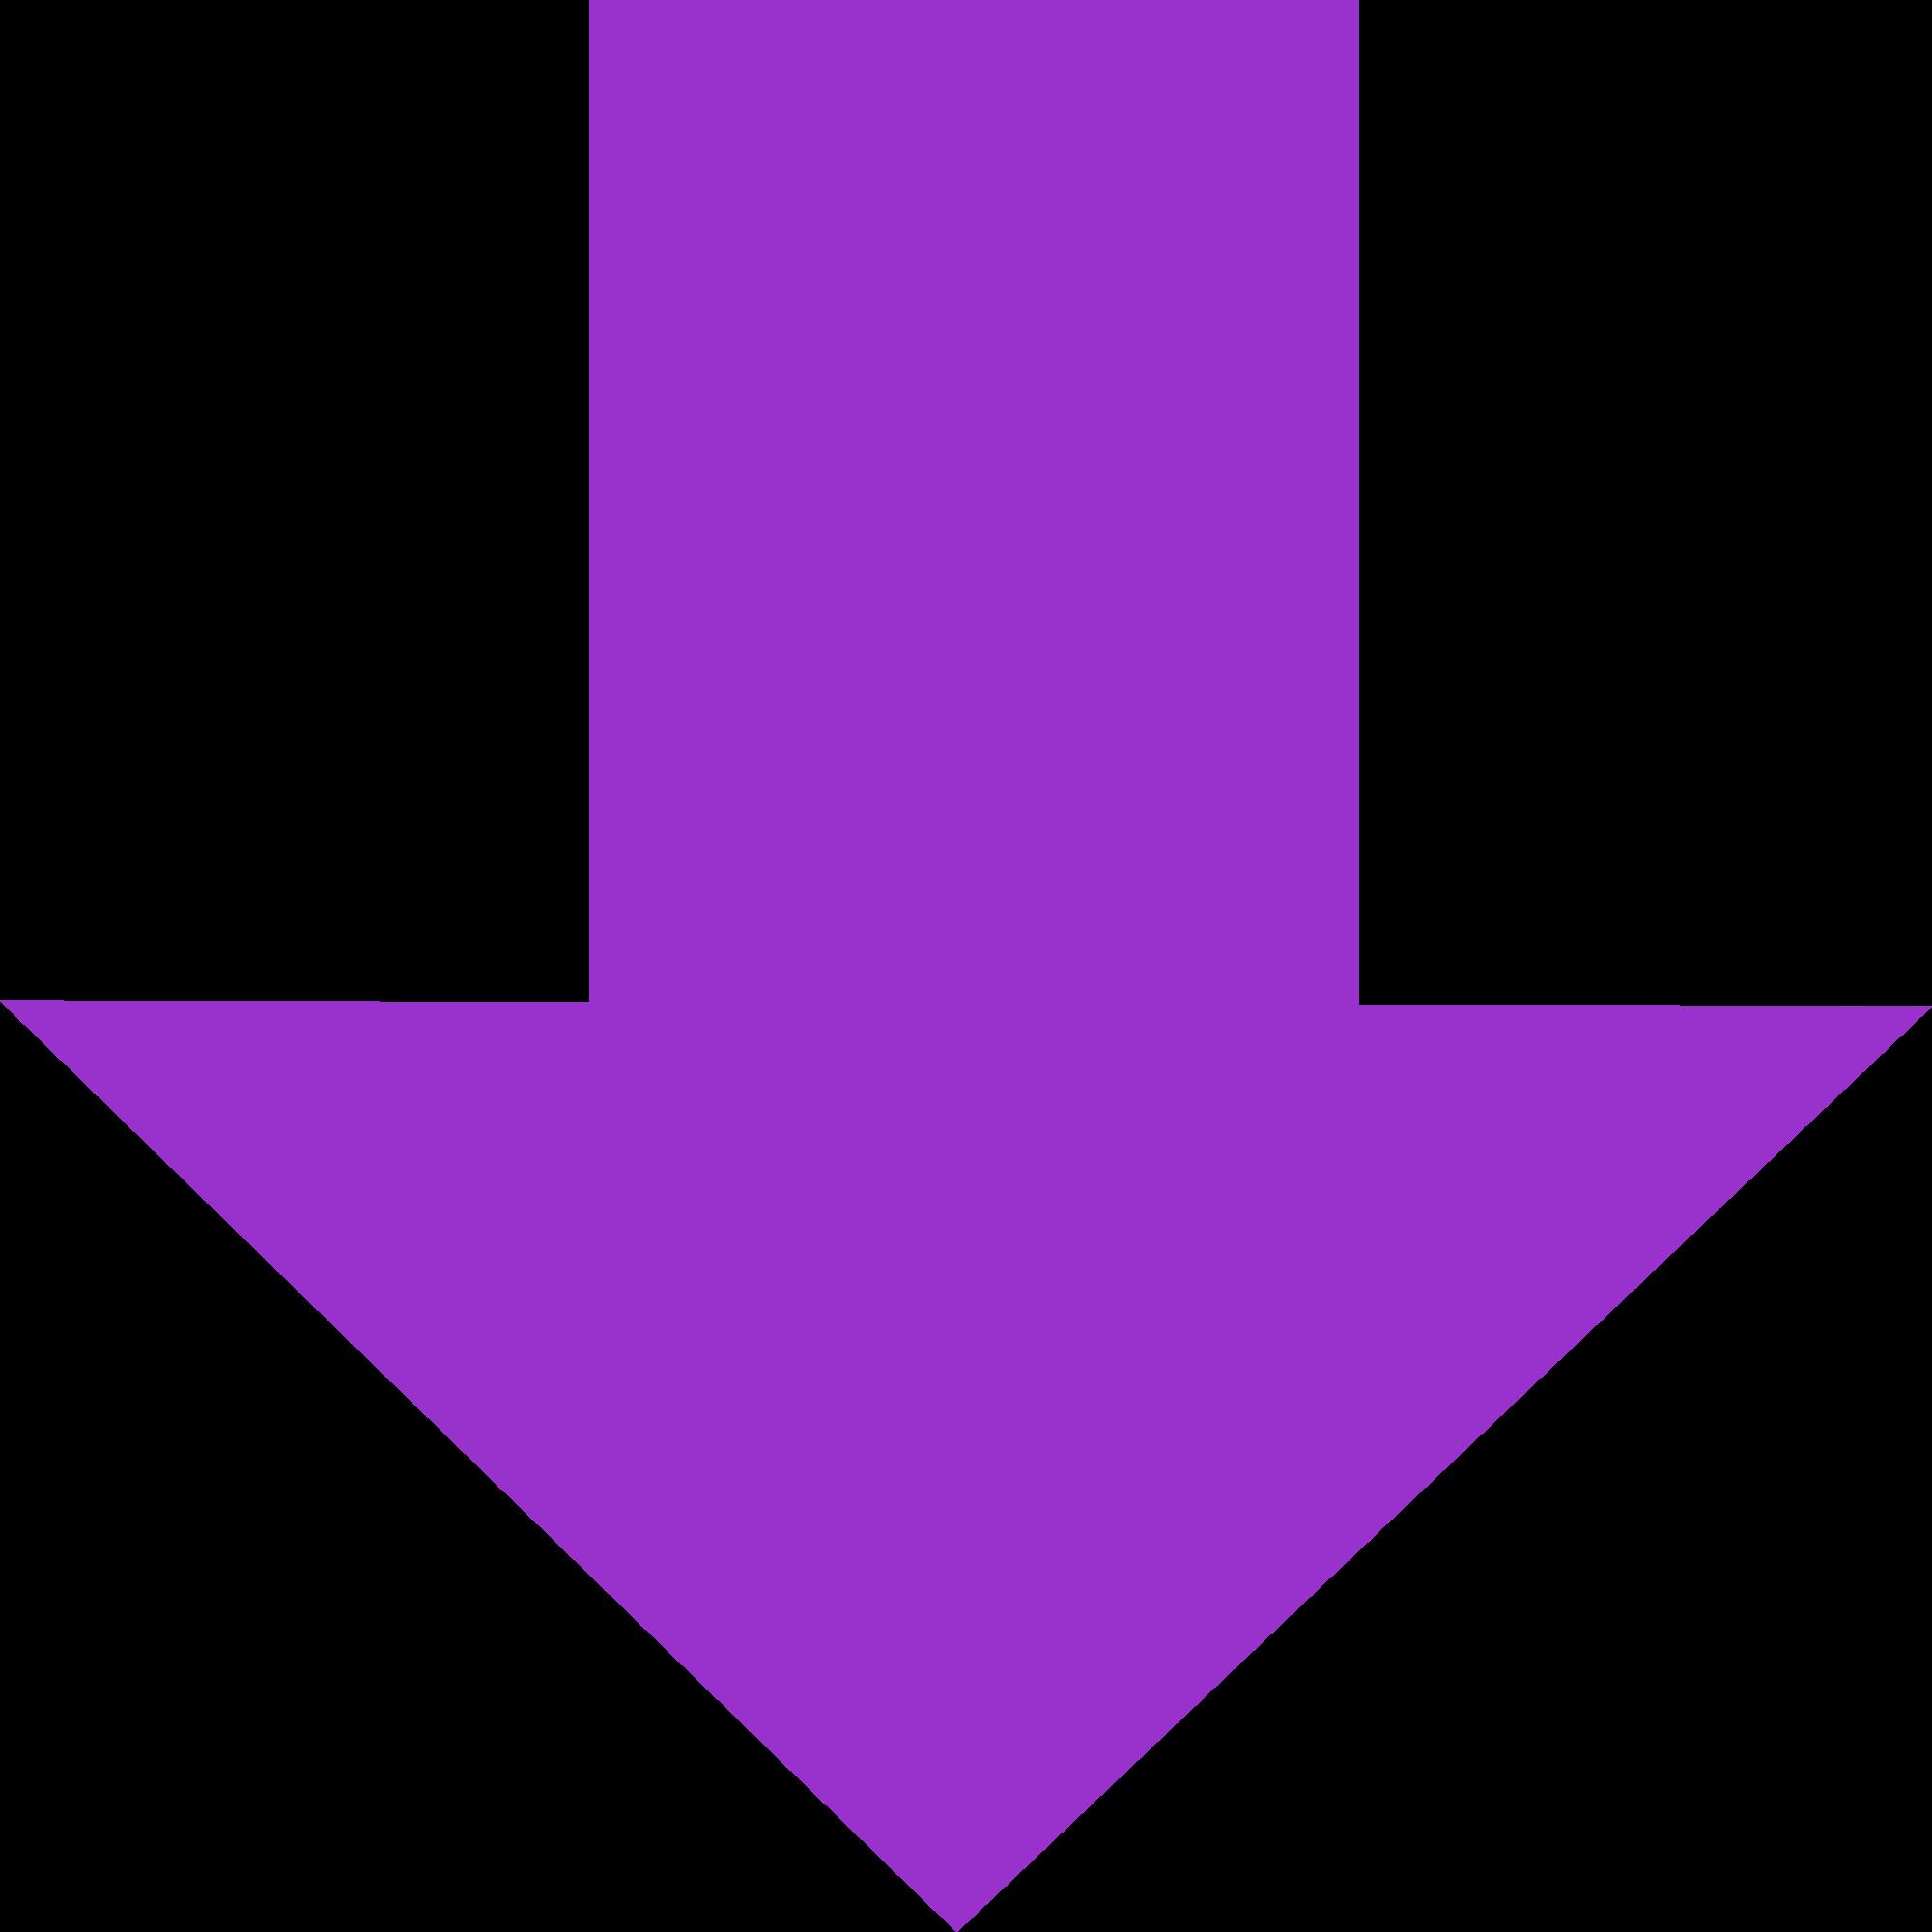 Pointing down arrow shop. Clipart arrows plain